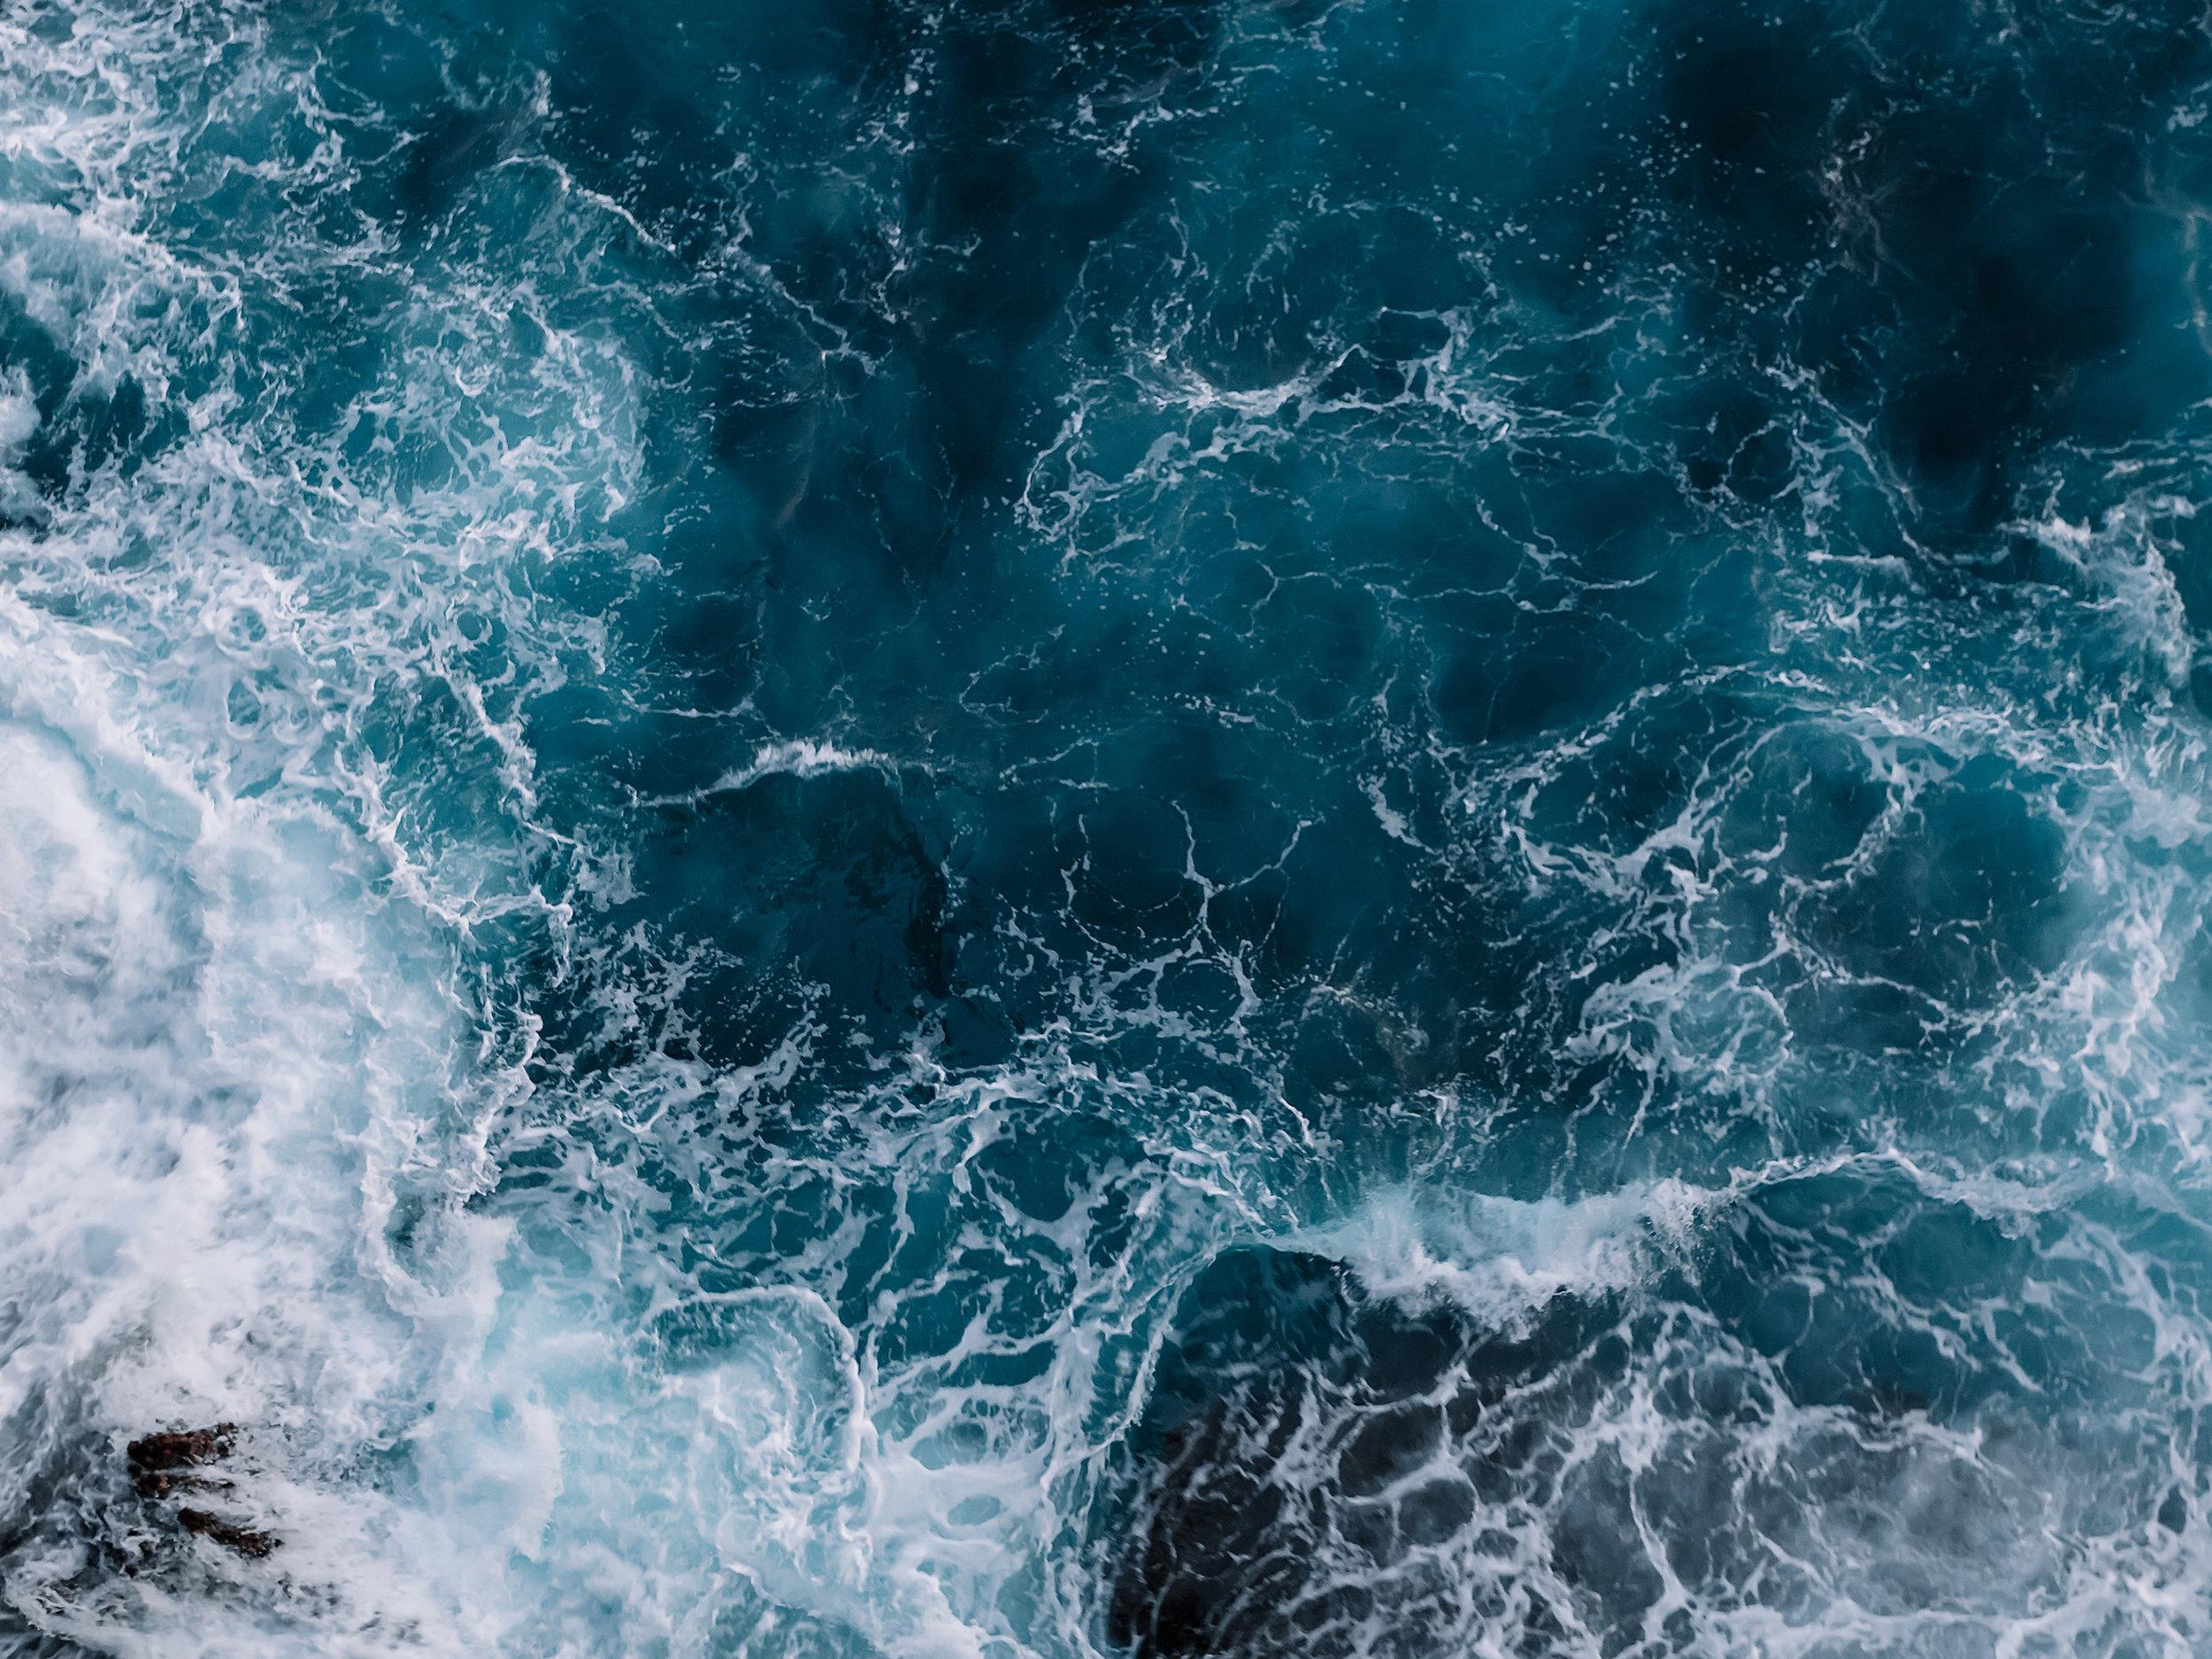 HUBBUB_OCEAN.jpg